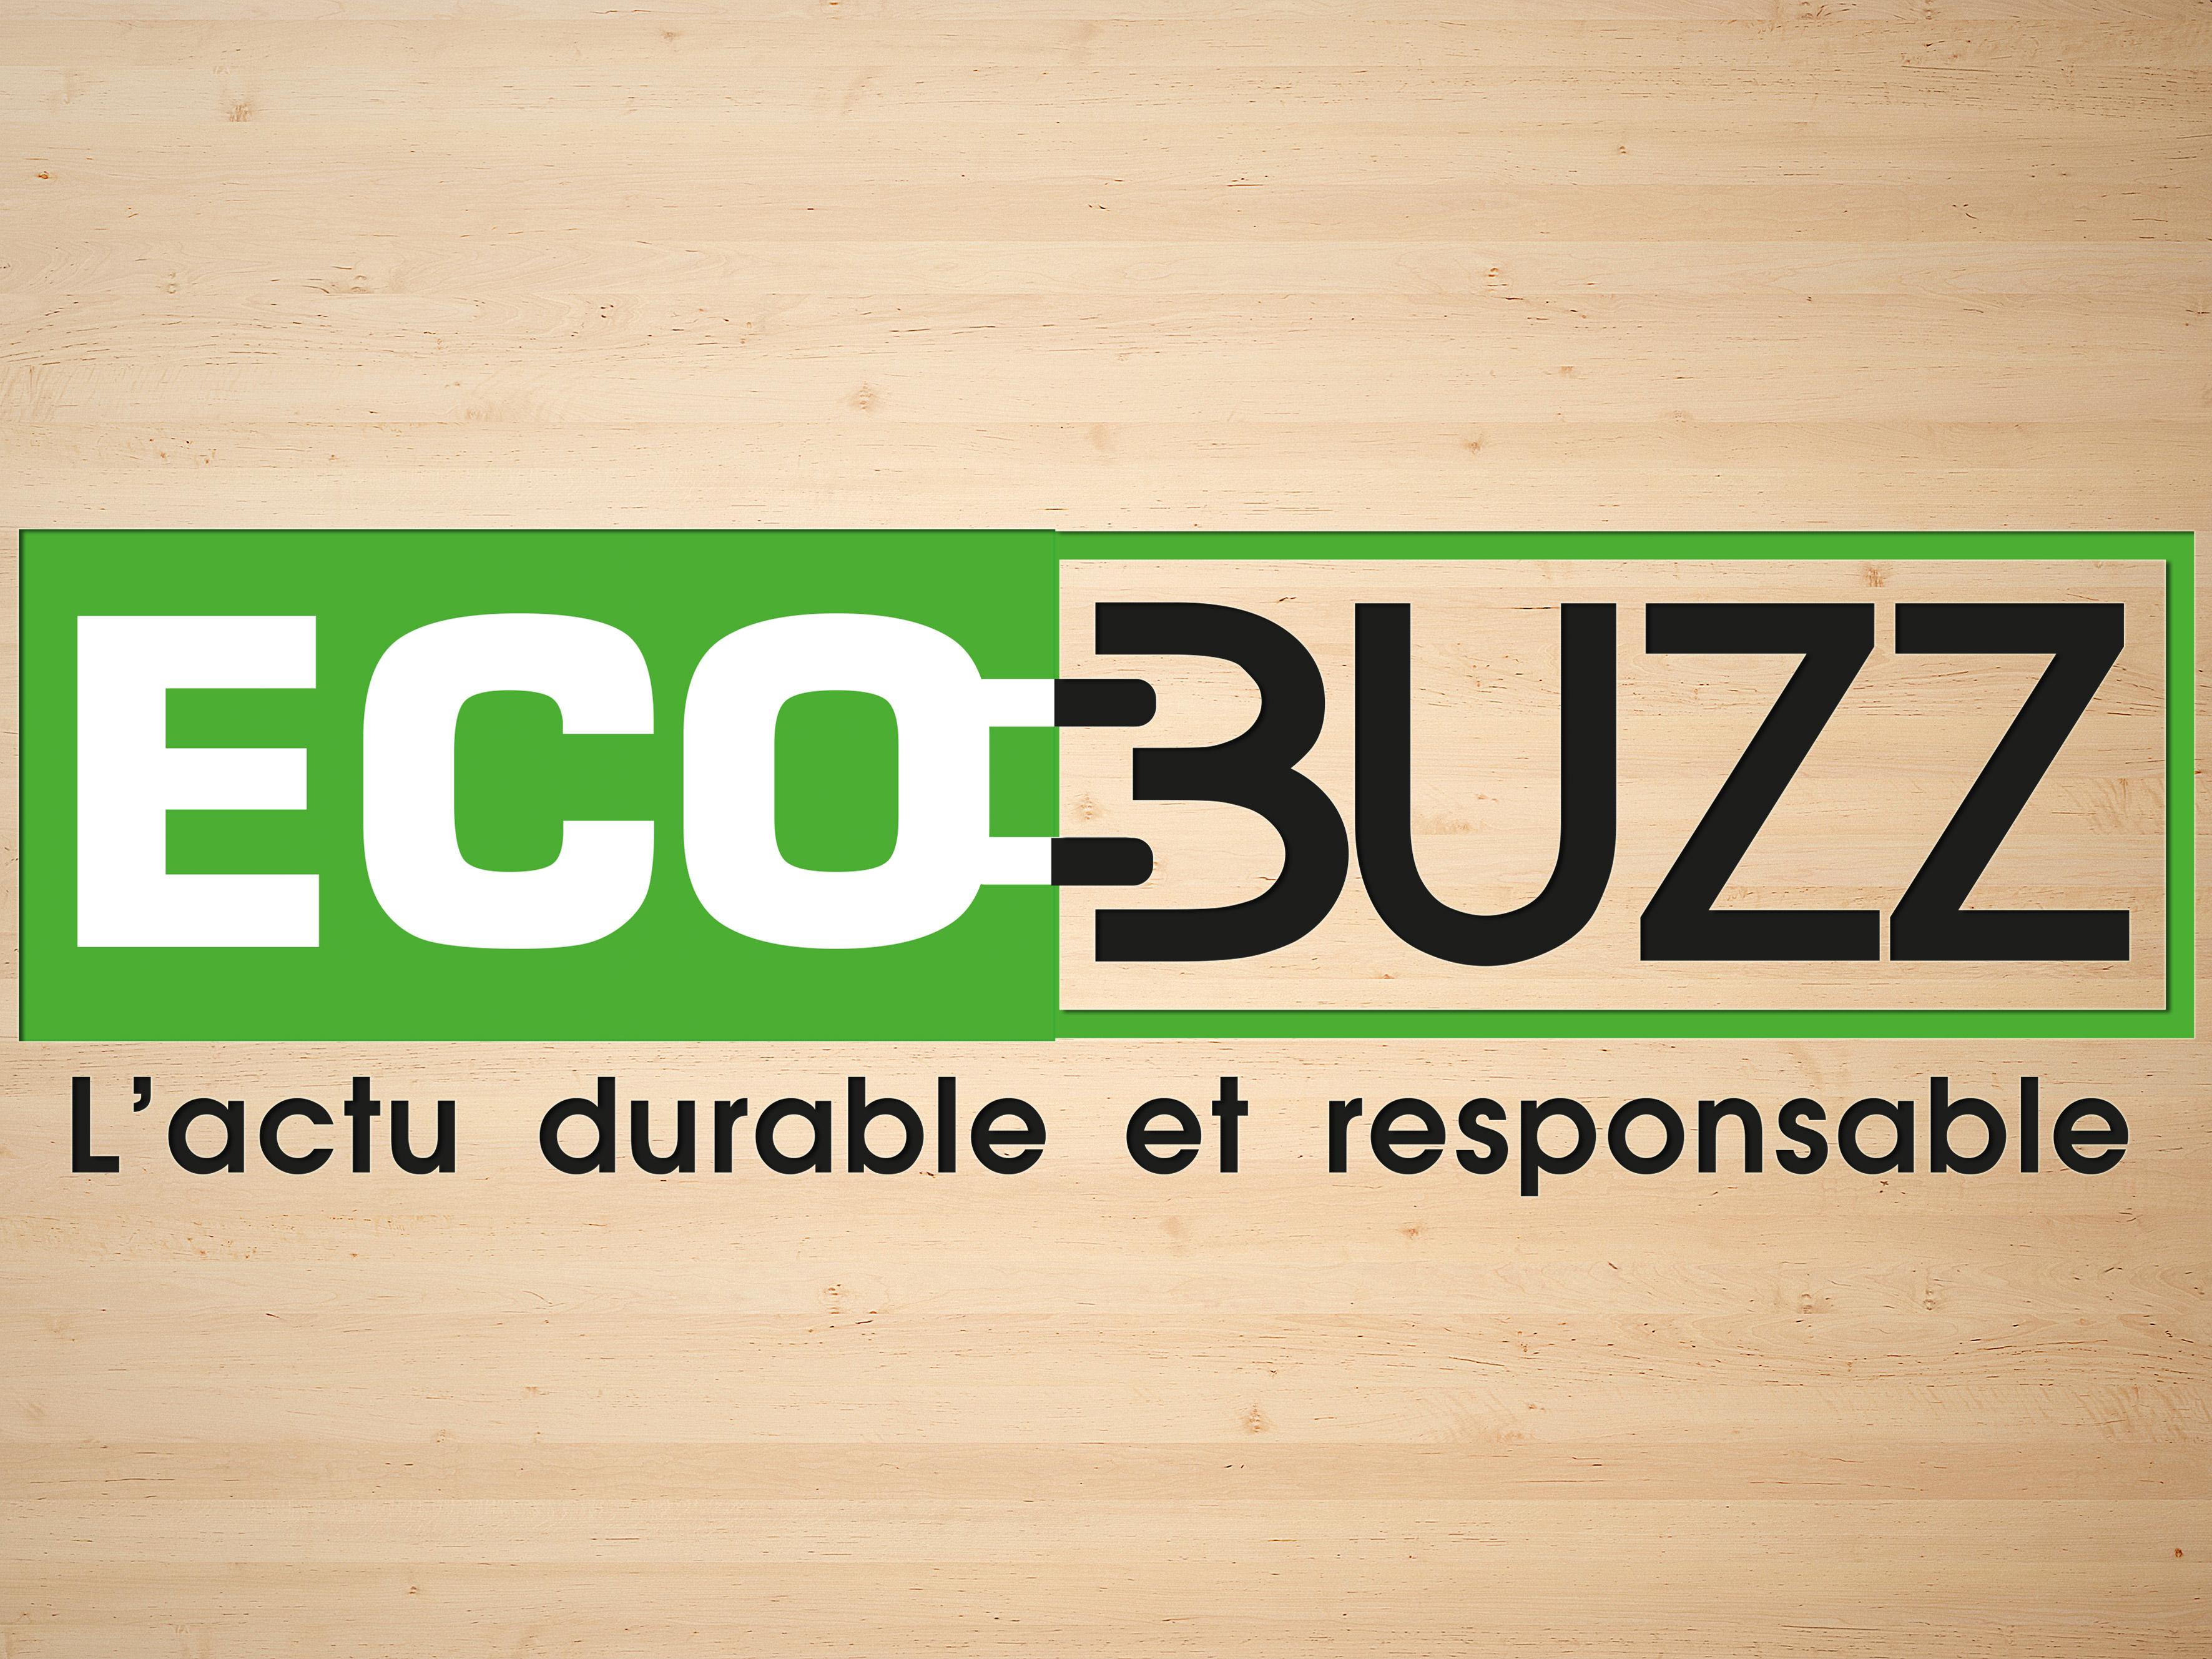 environnement durable